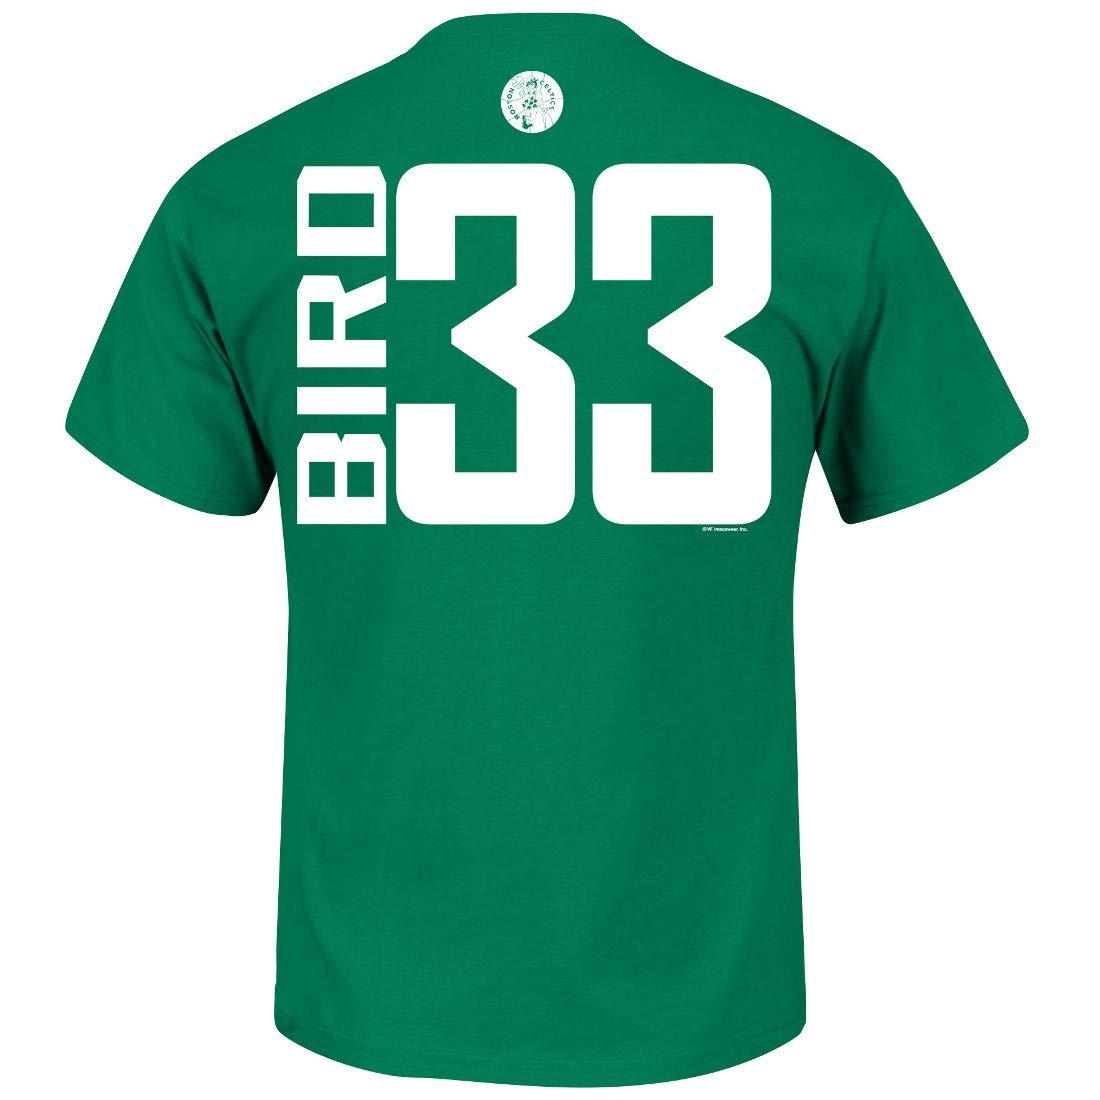 e403dc212 Amazon.com : VF Larry Bird Boston Celtics Majestic NBA Custom Throwback  Player T-Shirt : Sports & Outdoors